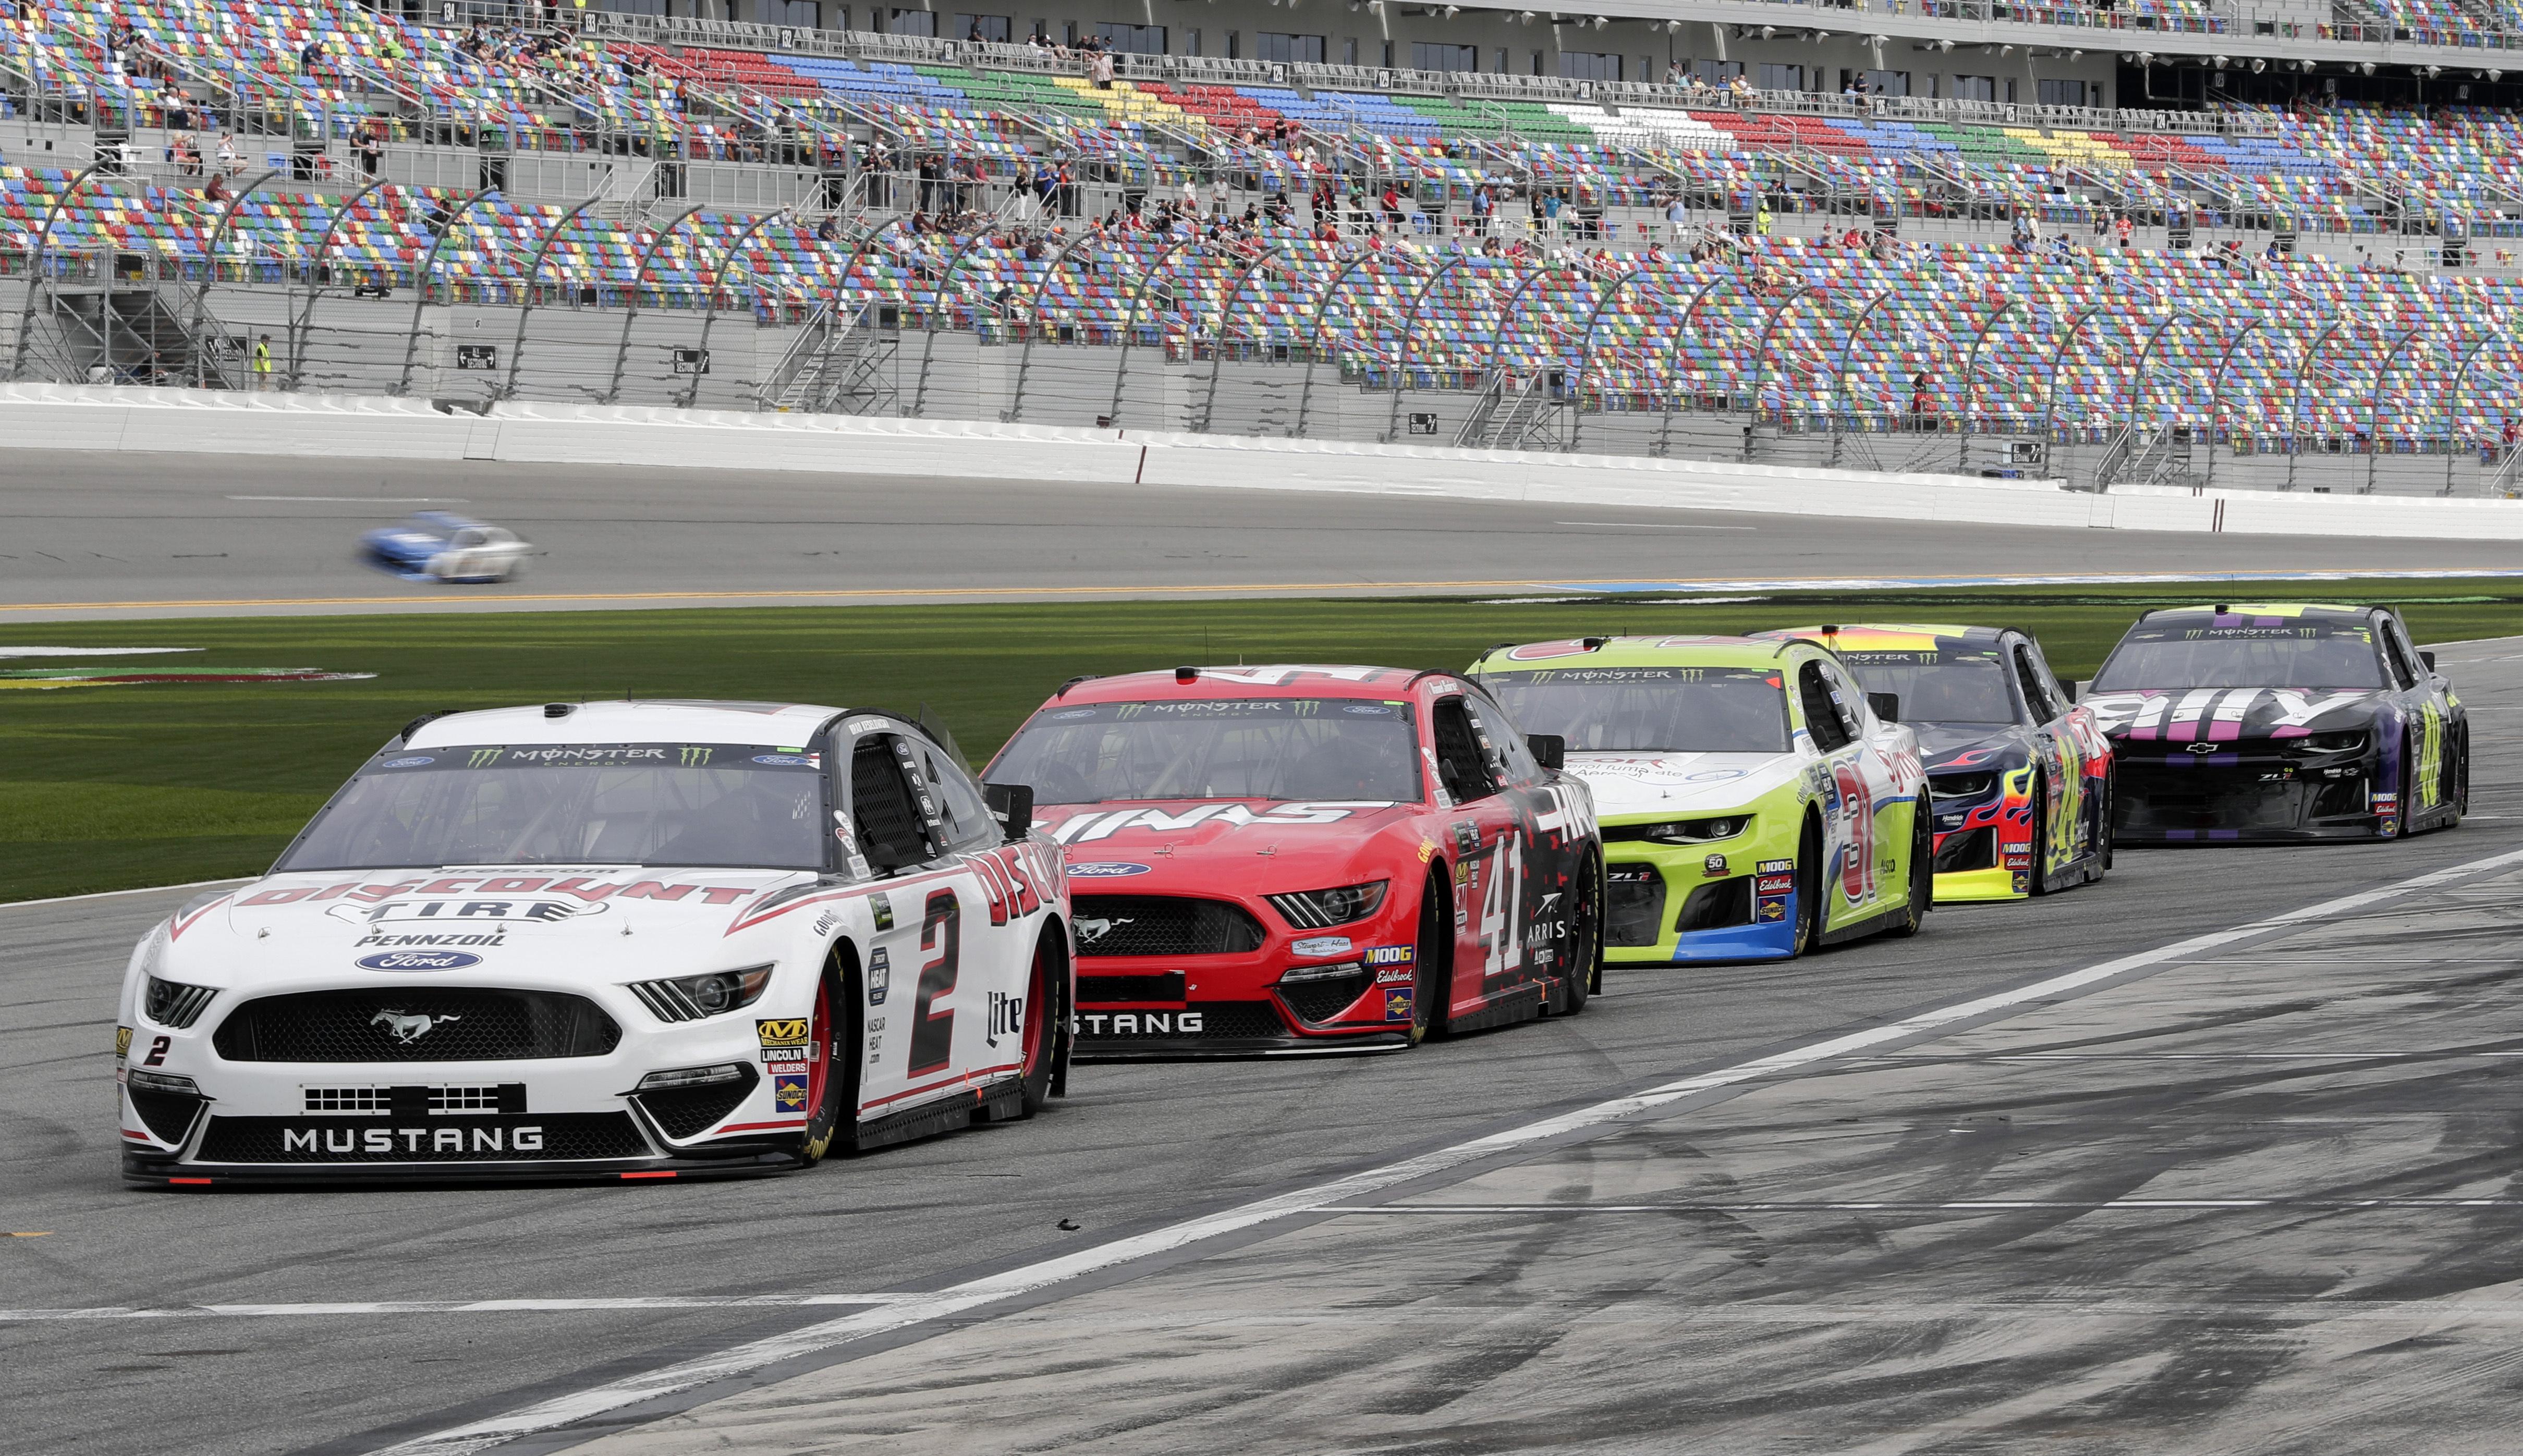 New-look Daytona 500 has a certain throwback feel